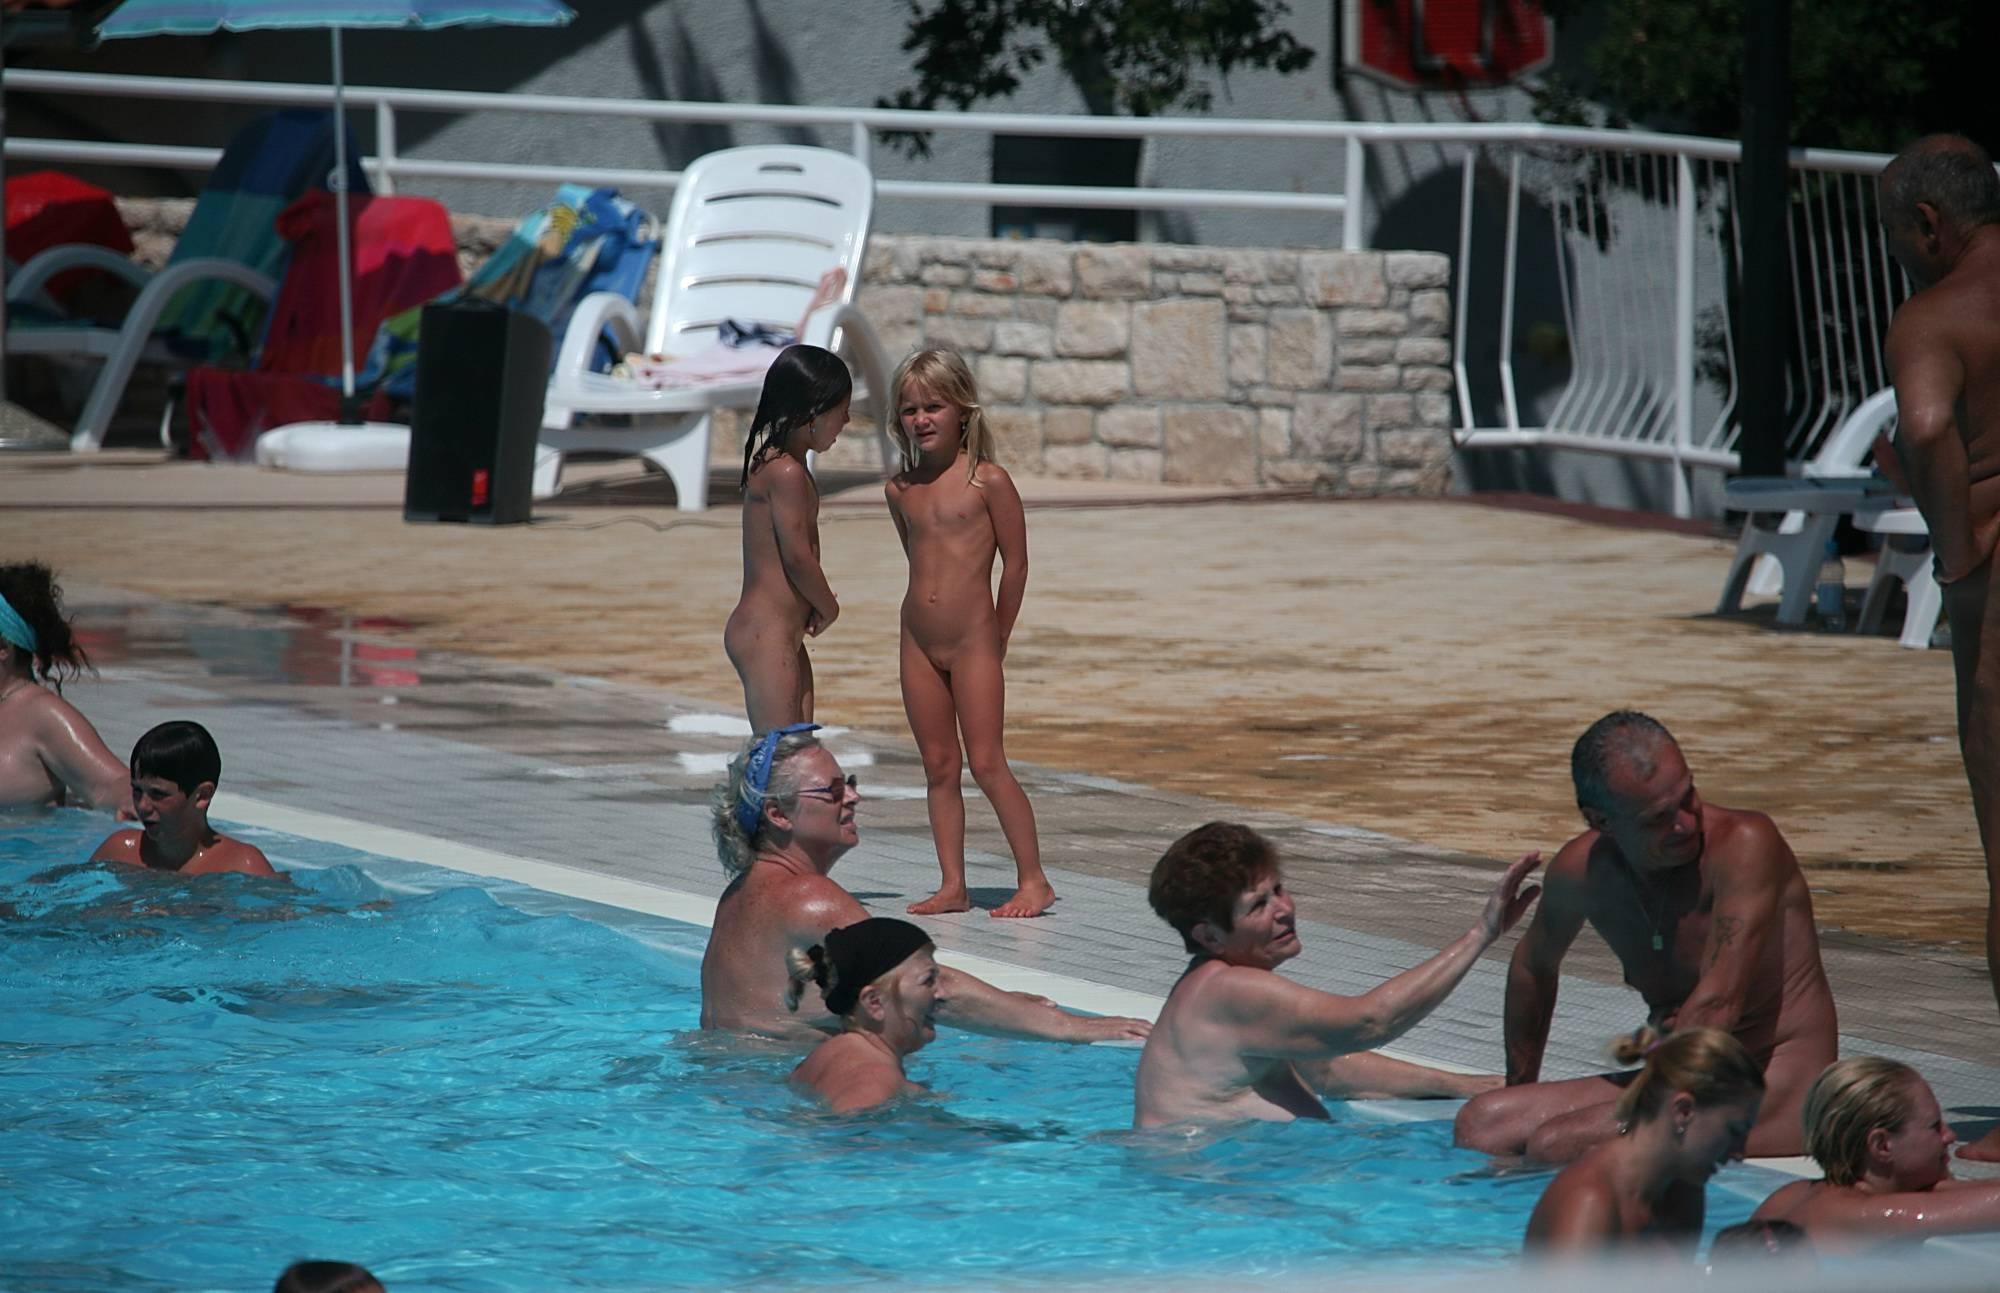 Pool Area Water Scenery - 1